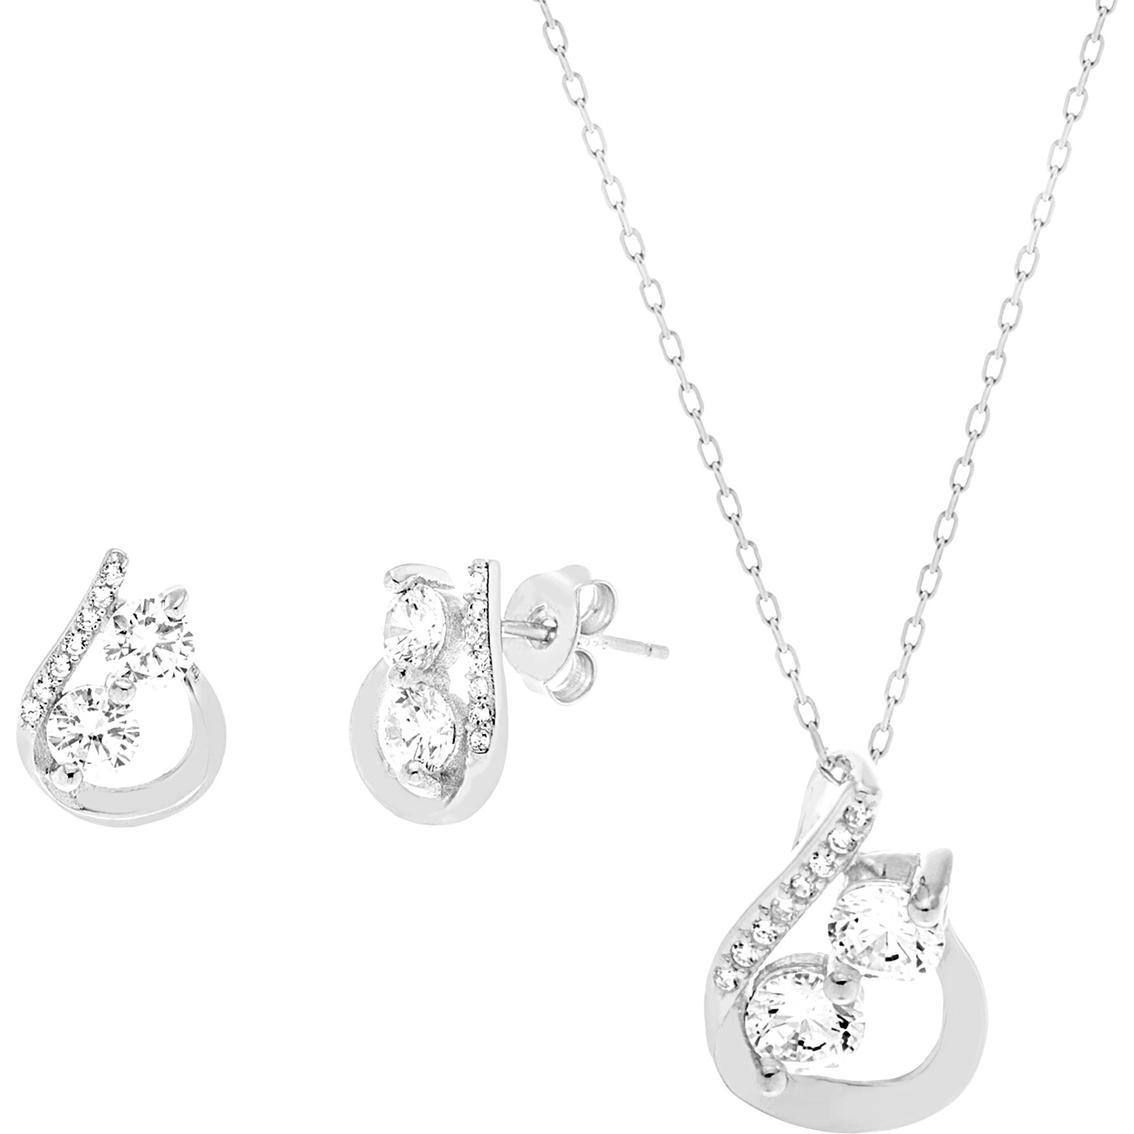 d5fe0278e Sterling Silver Two Stone Cubic Zirconia Crossed Teardrop Pendant and Earrings  Set